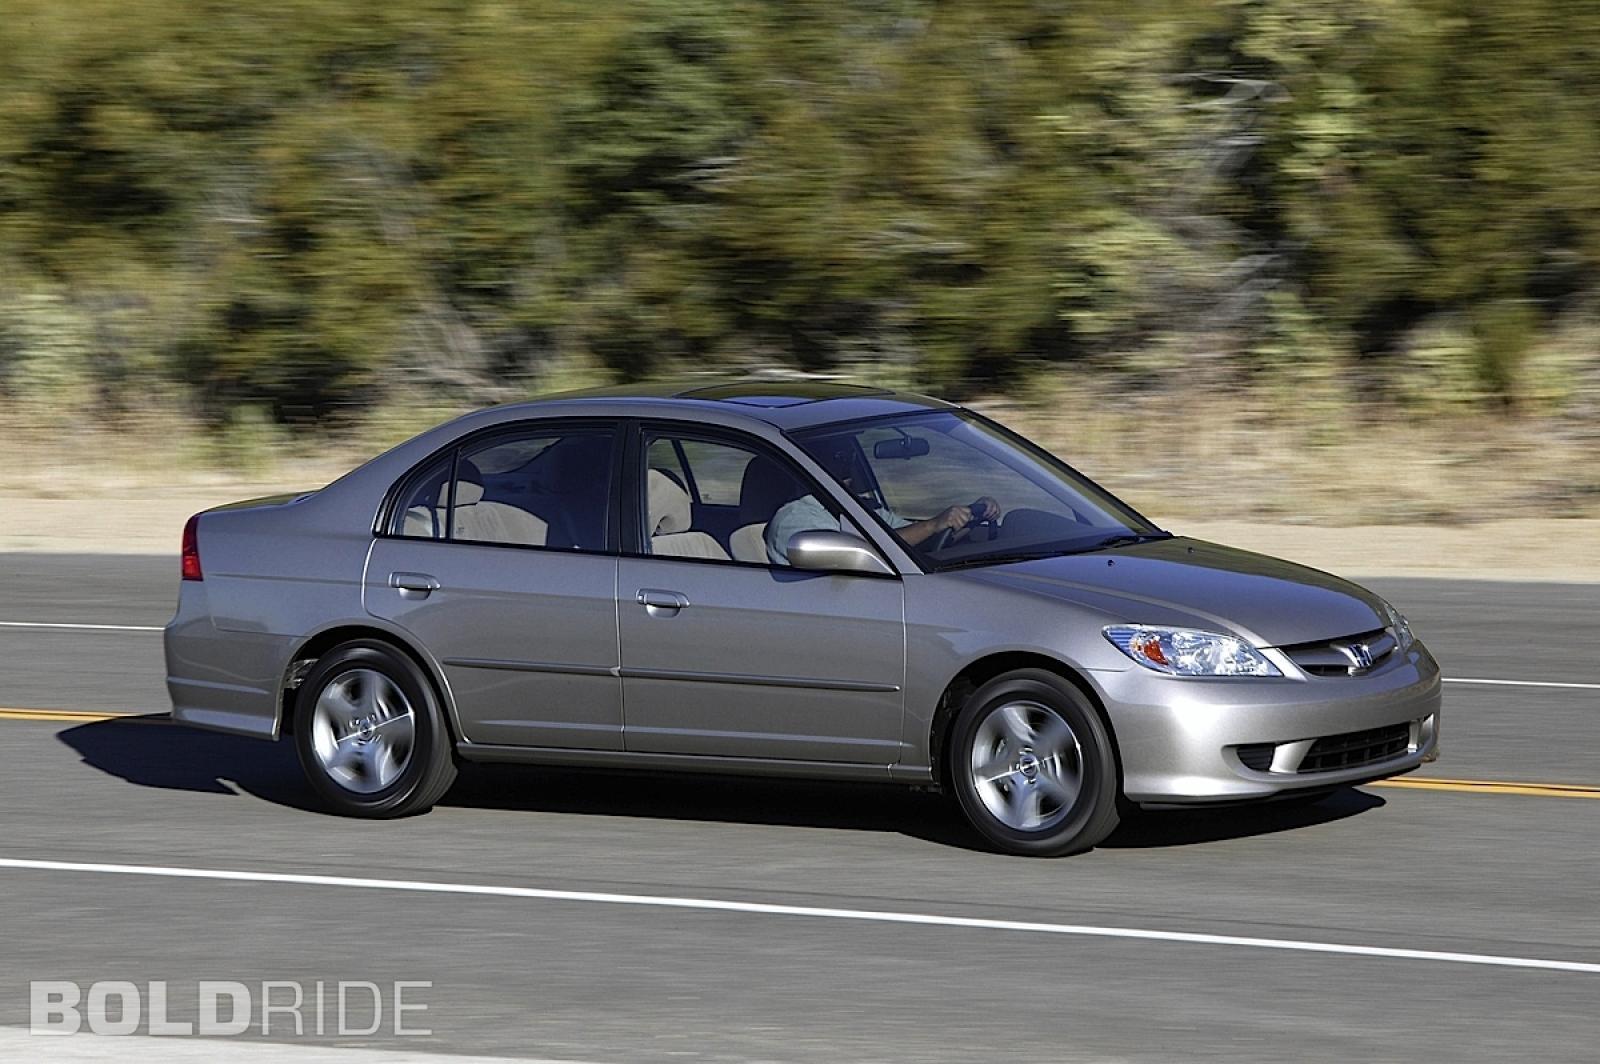 800 1024 1280 1600 Origin 2005 Honda Civic ...